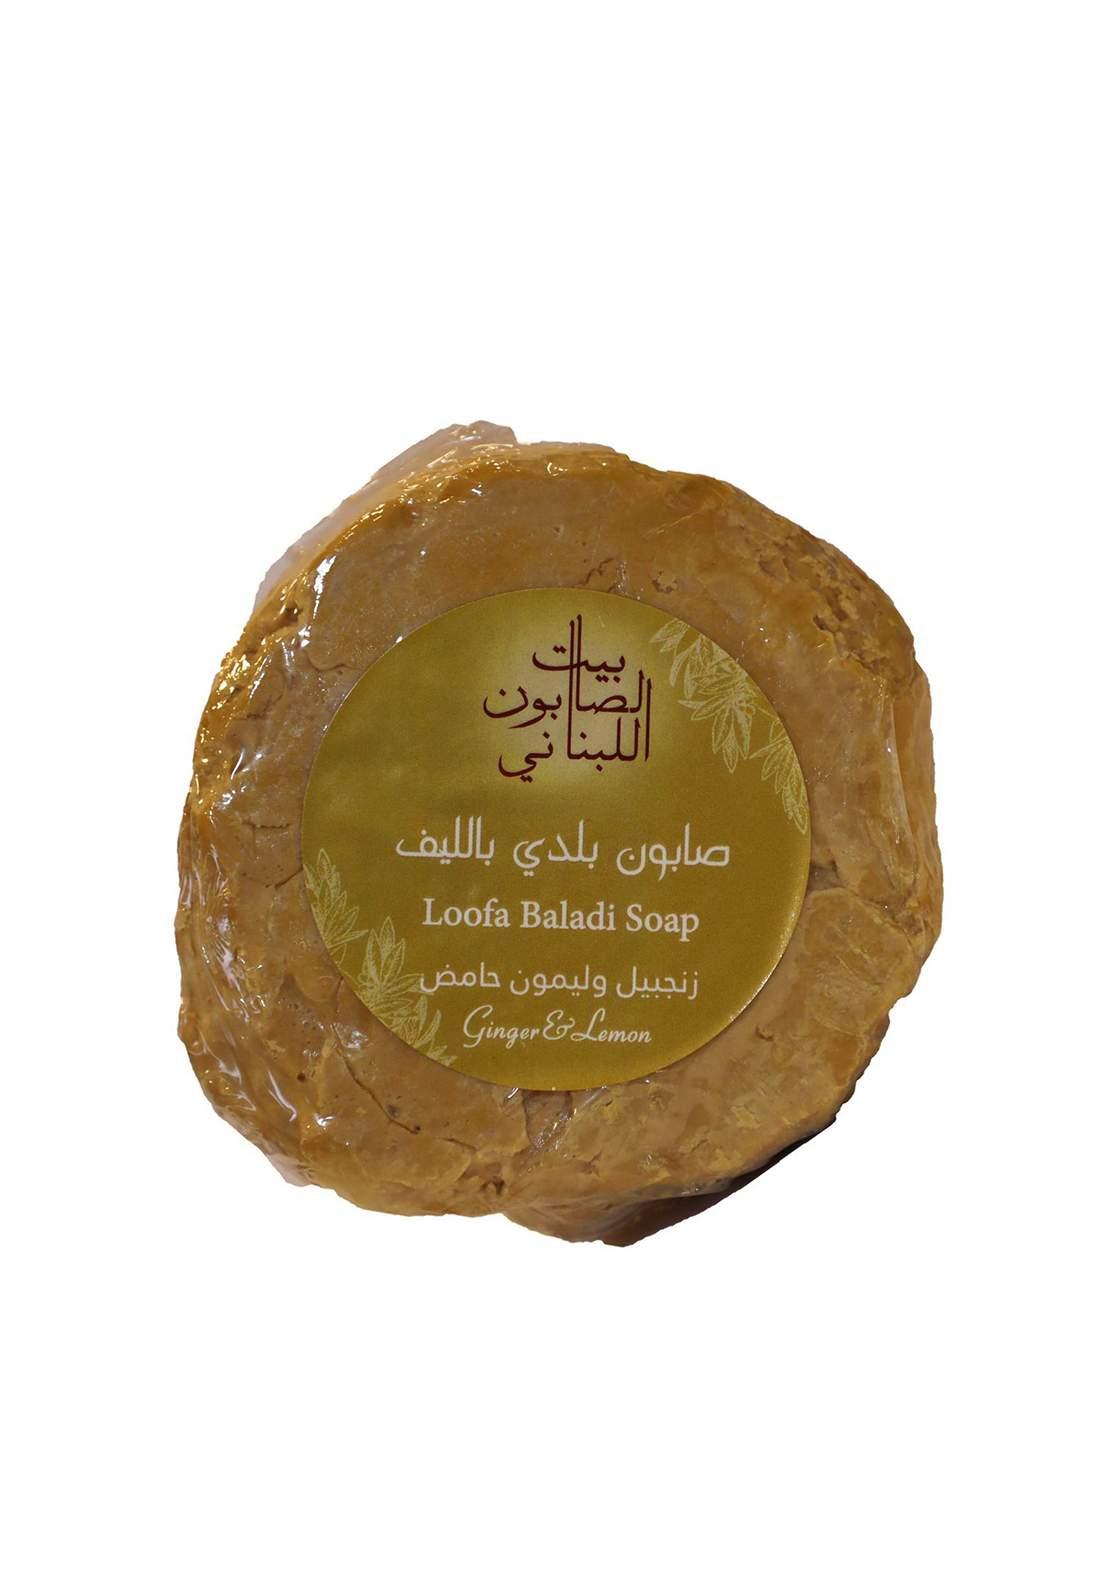 Bayt Alsaboun Alloubnani-317467 Loofa Baladi Soap Ginger&Lemon 300g صابون